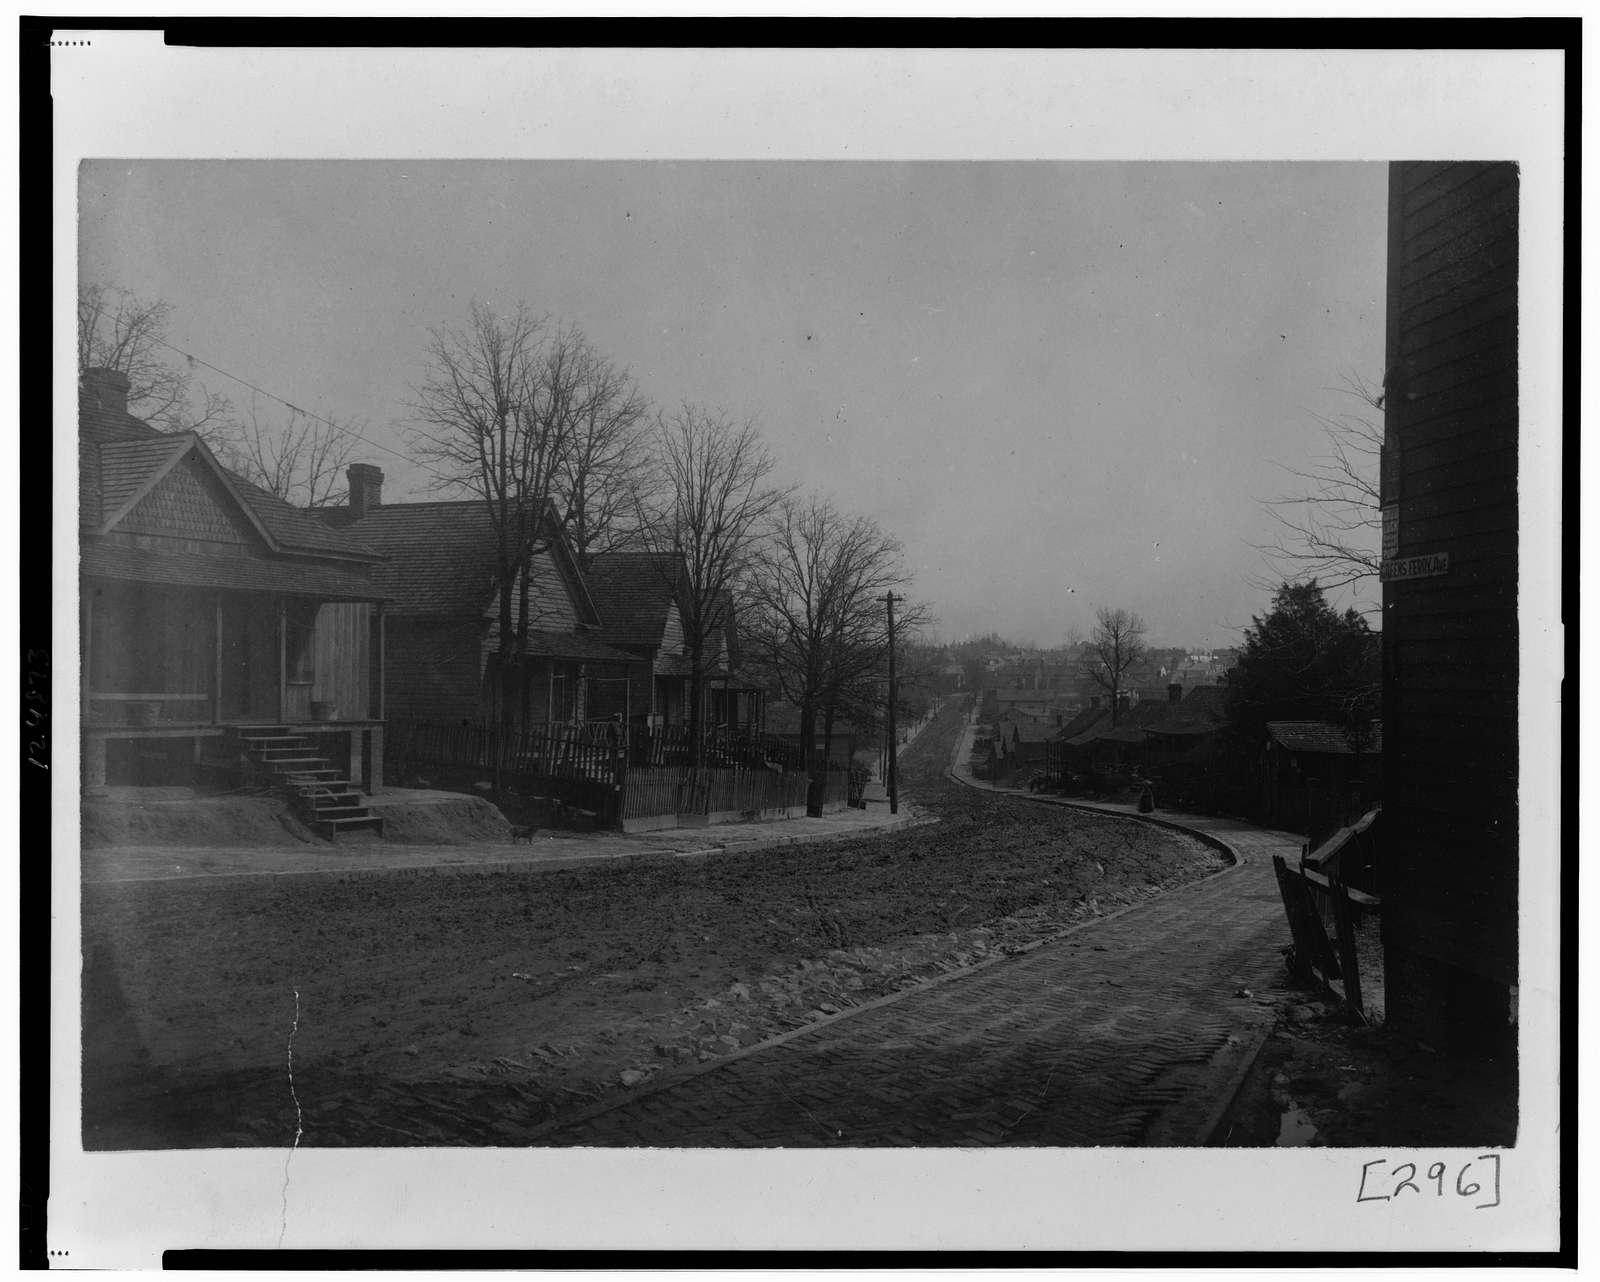 [Exterior view of houses along unpaved street, Greensferry Ave., N.W., Atlanta, Georgia]